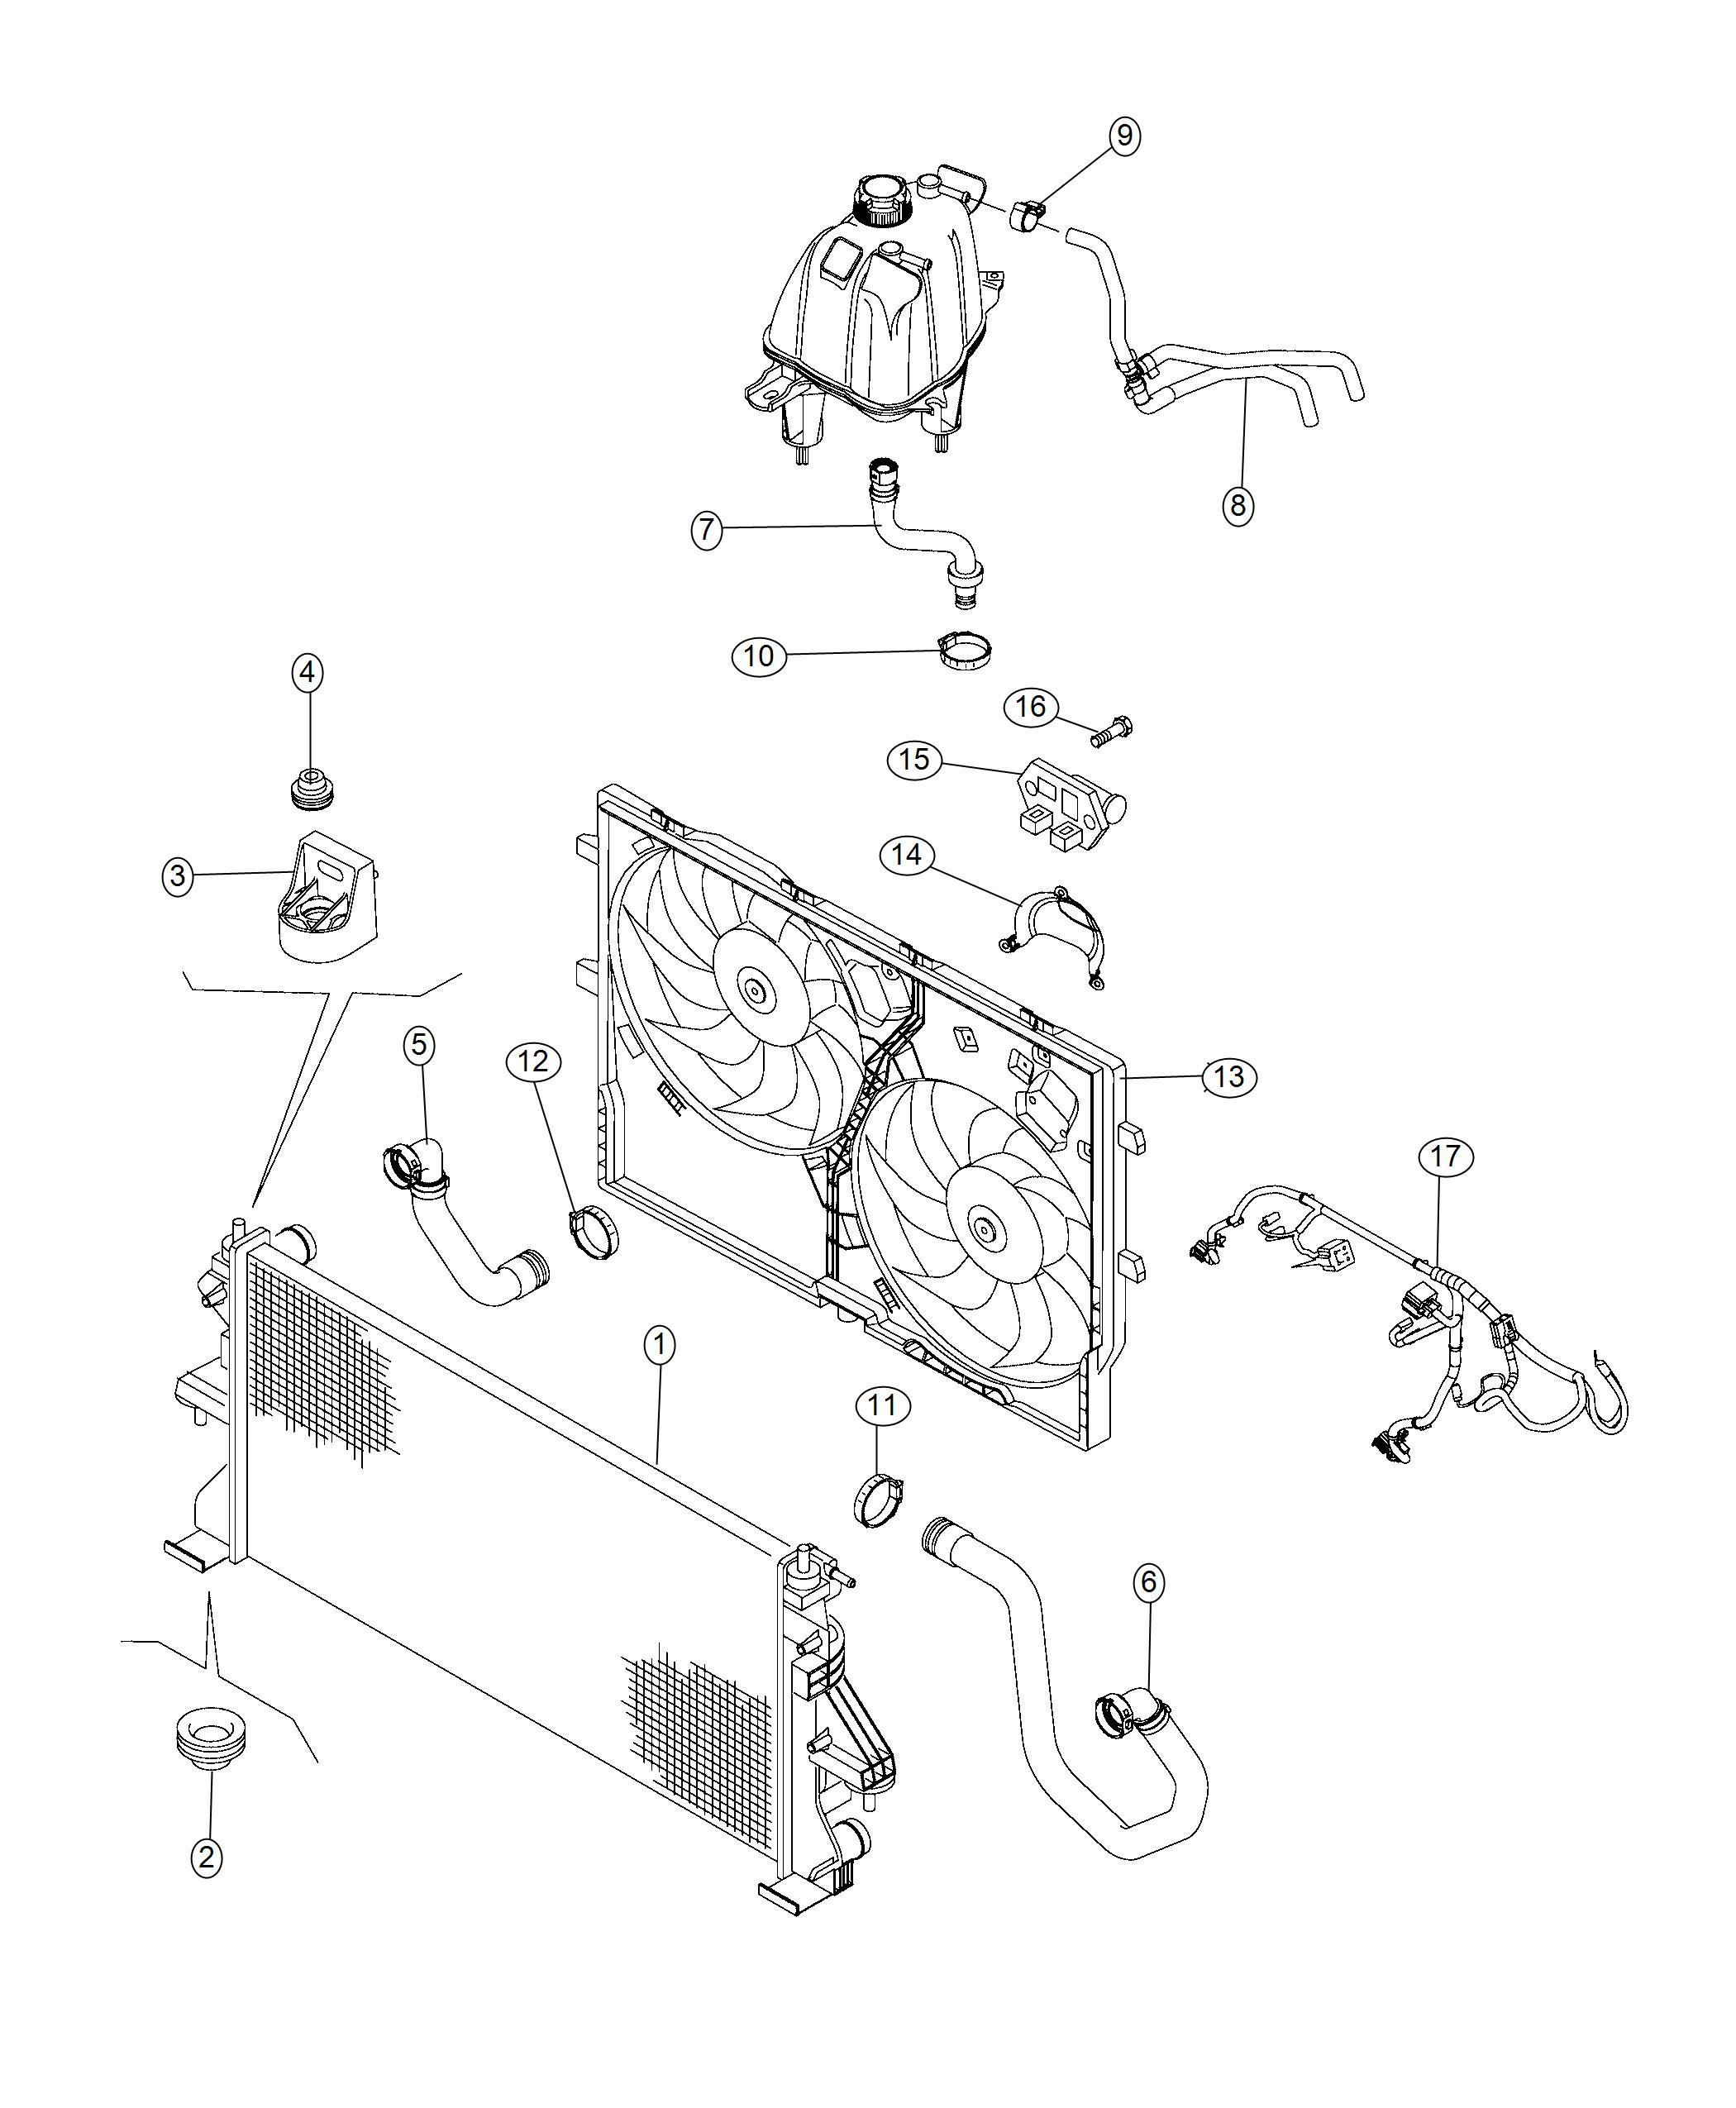 Ram Resistor Radiator Fan Air Conditioning